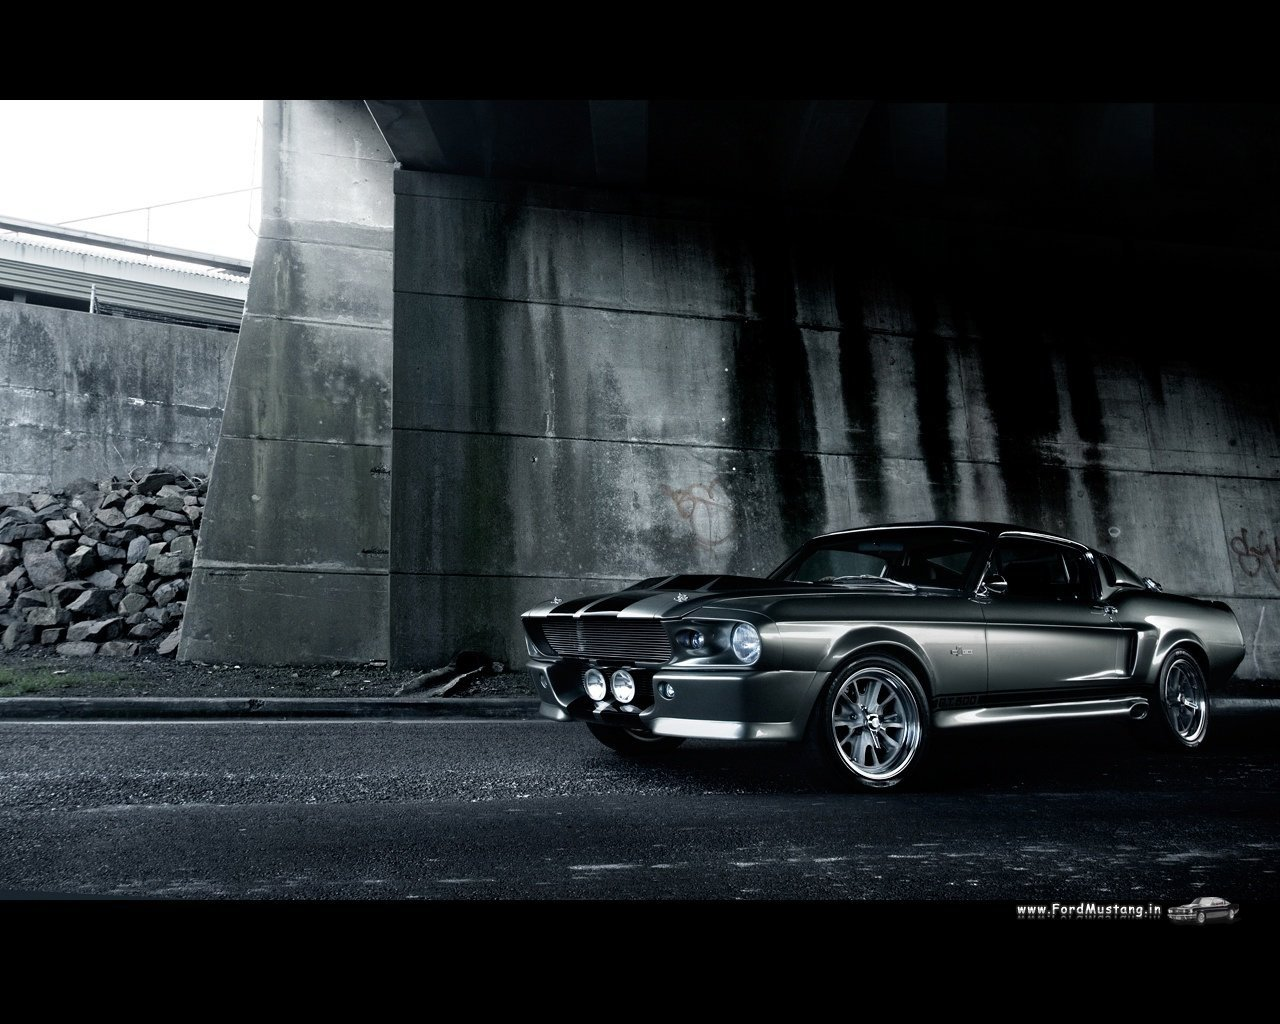 Muscle Car Wallpapers 1280x1024 Desktop Backgrounds